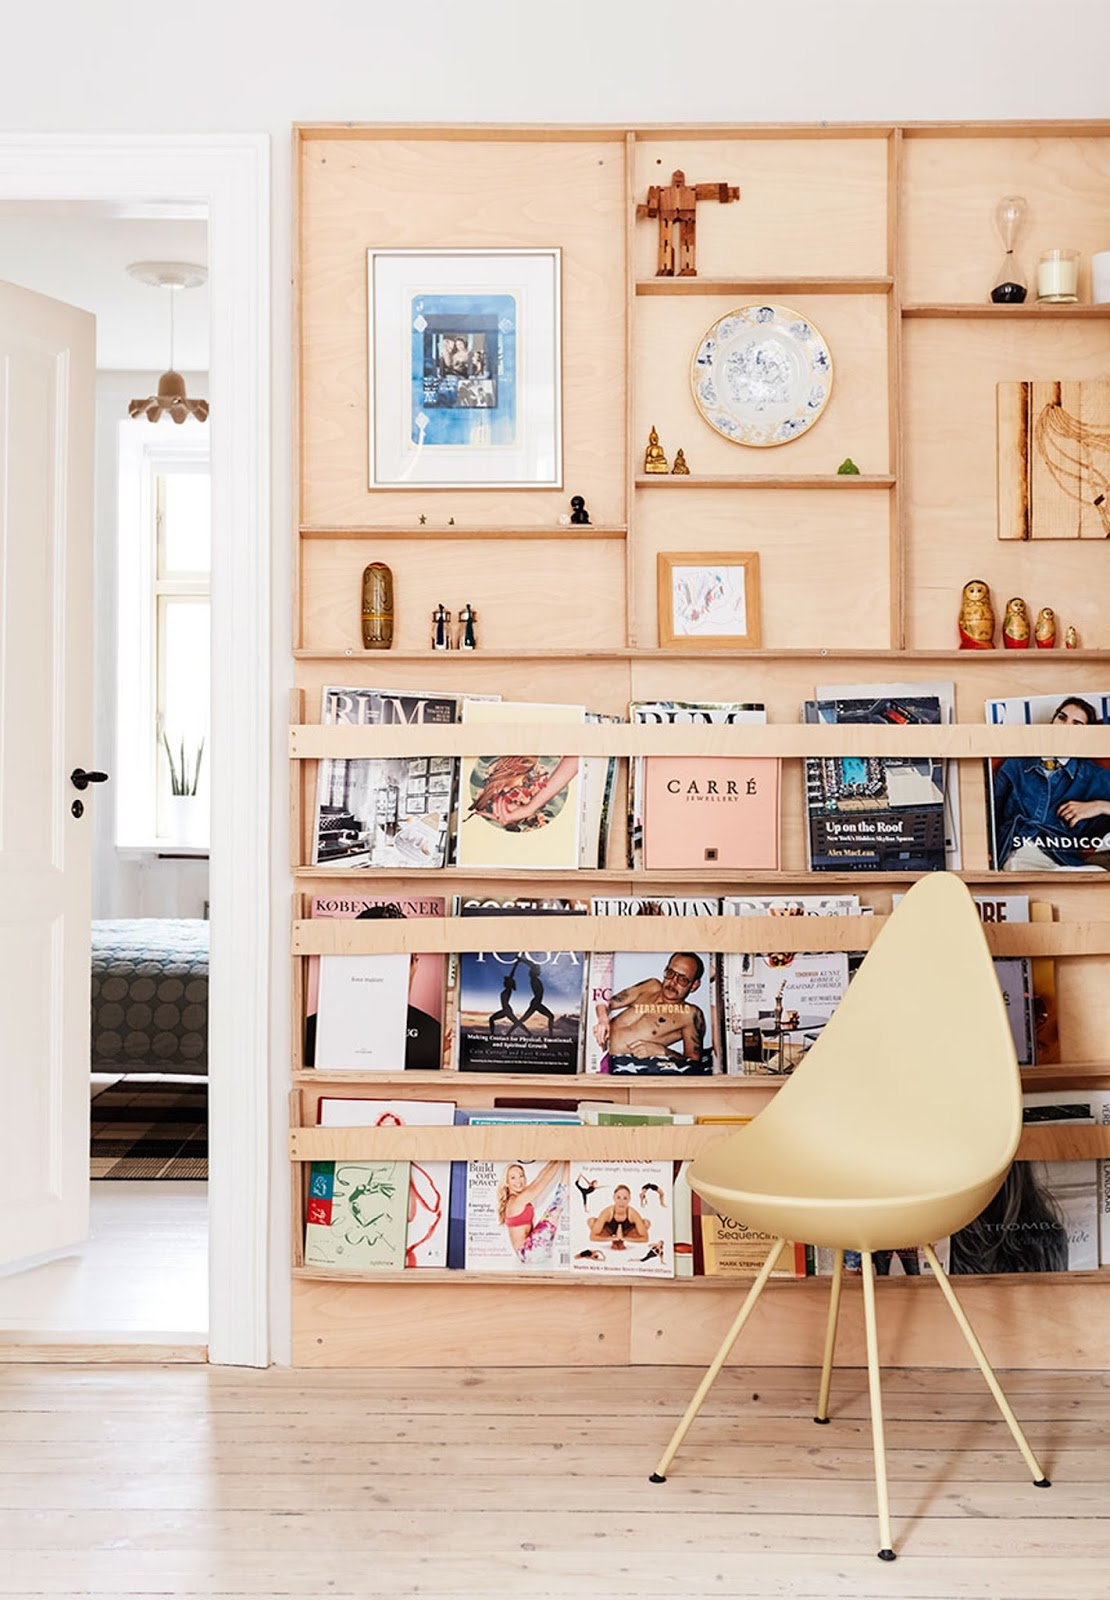 plywood design bookshelf, danish design, scandinavian apartment, interior design